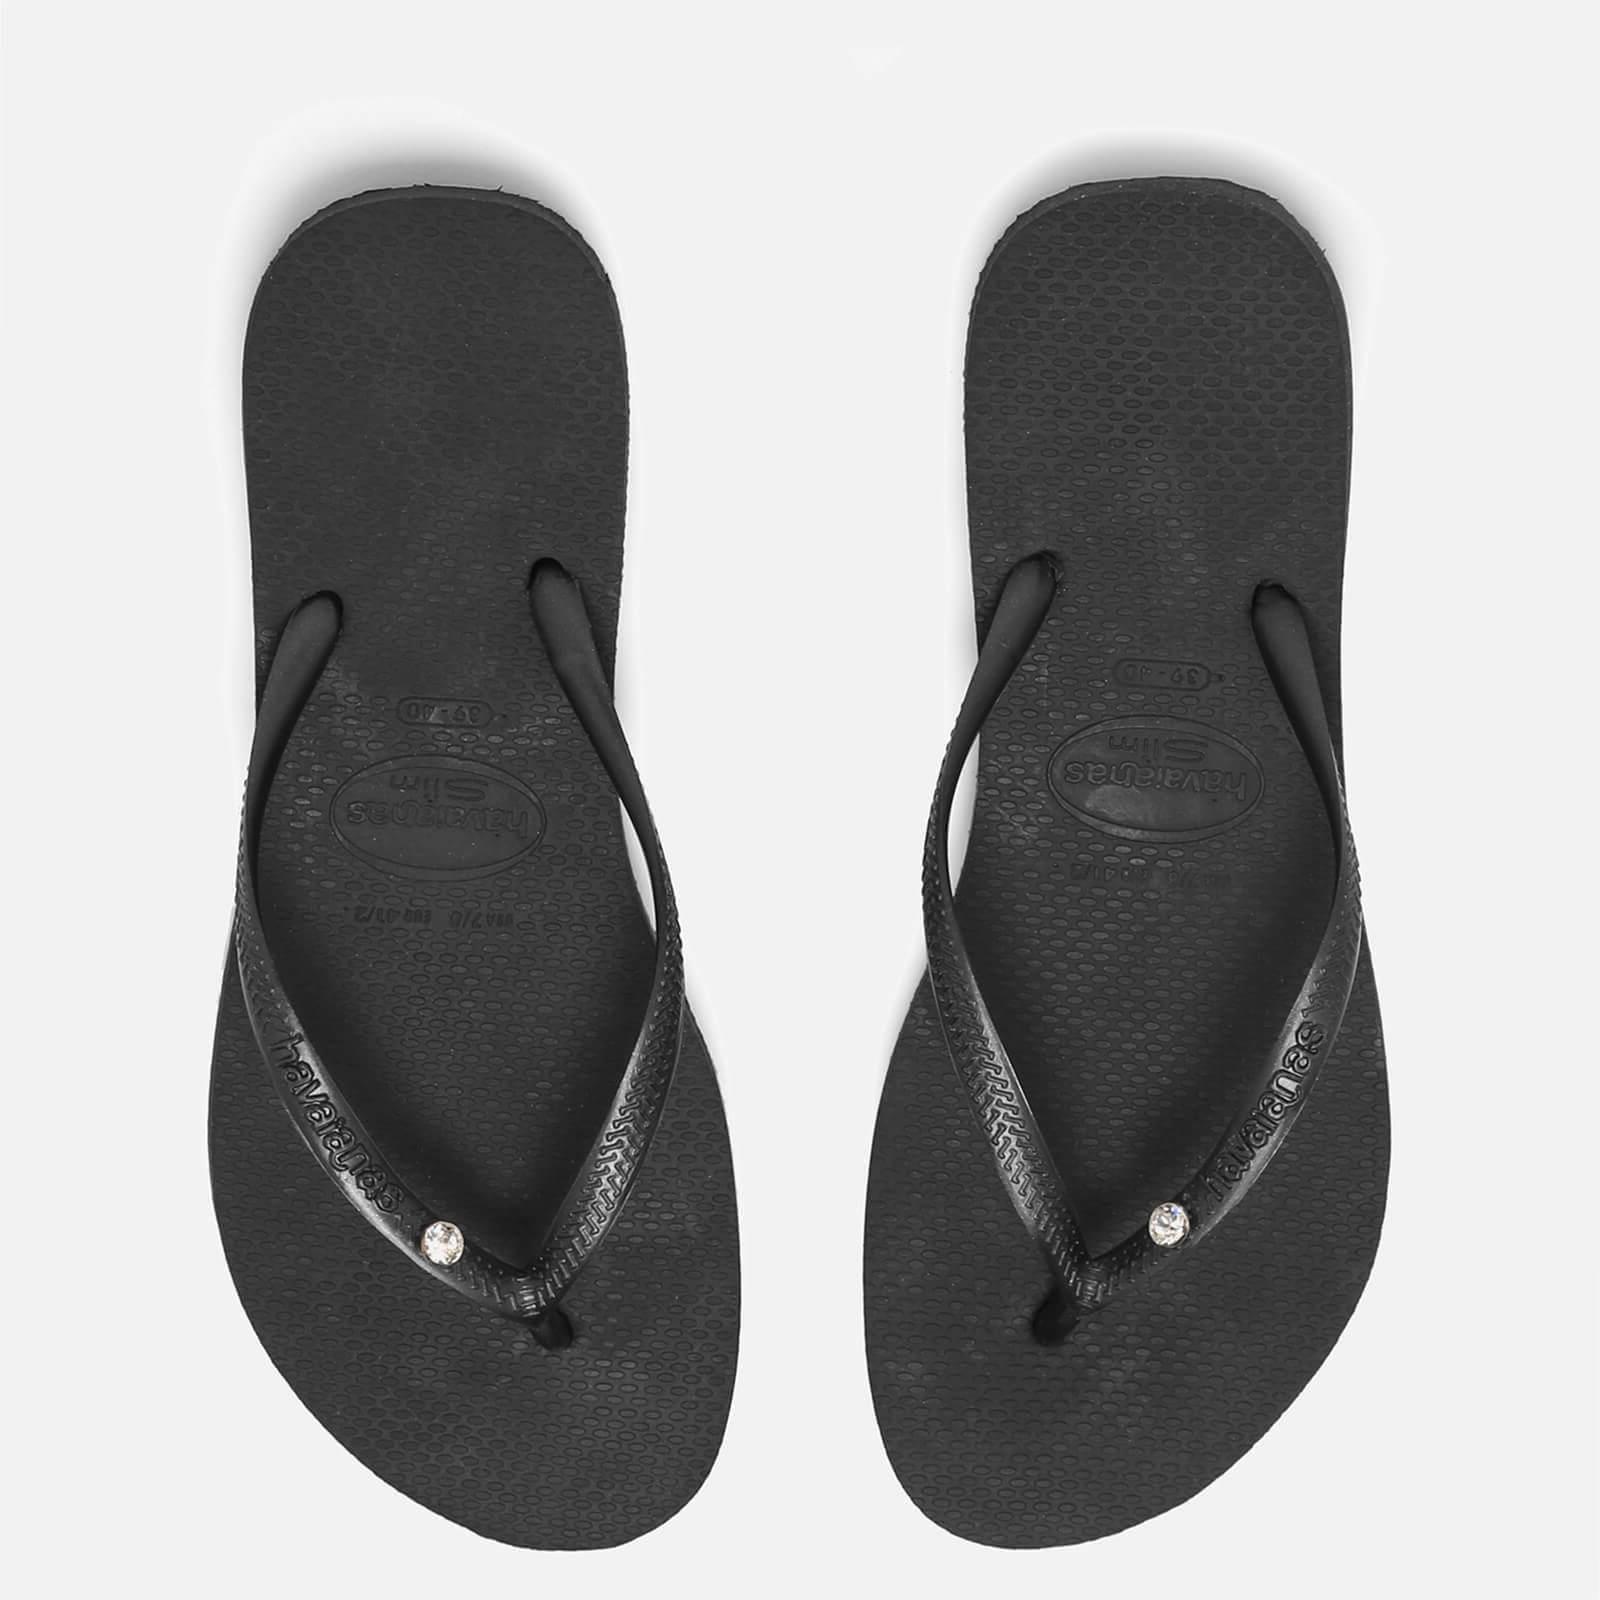 Havaianas Women's Slim Swarovski Crystal Glamour Flip Flops - Black - EU 41-42/UK 8-9 - Black